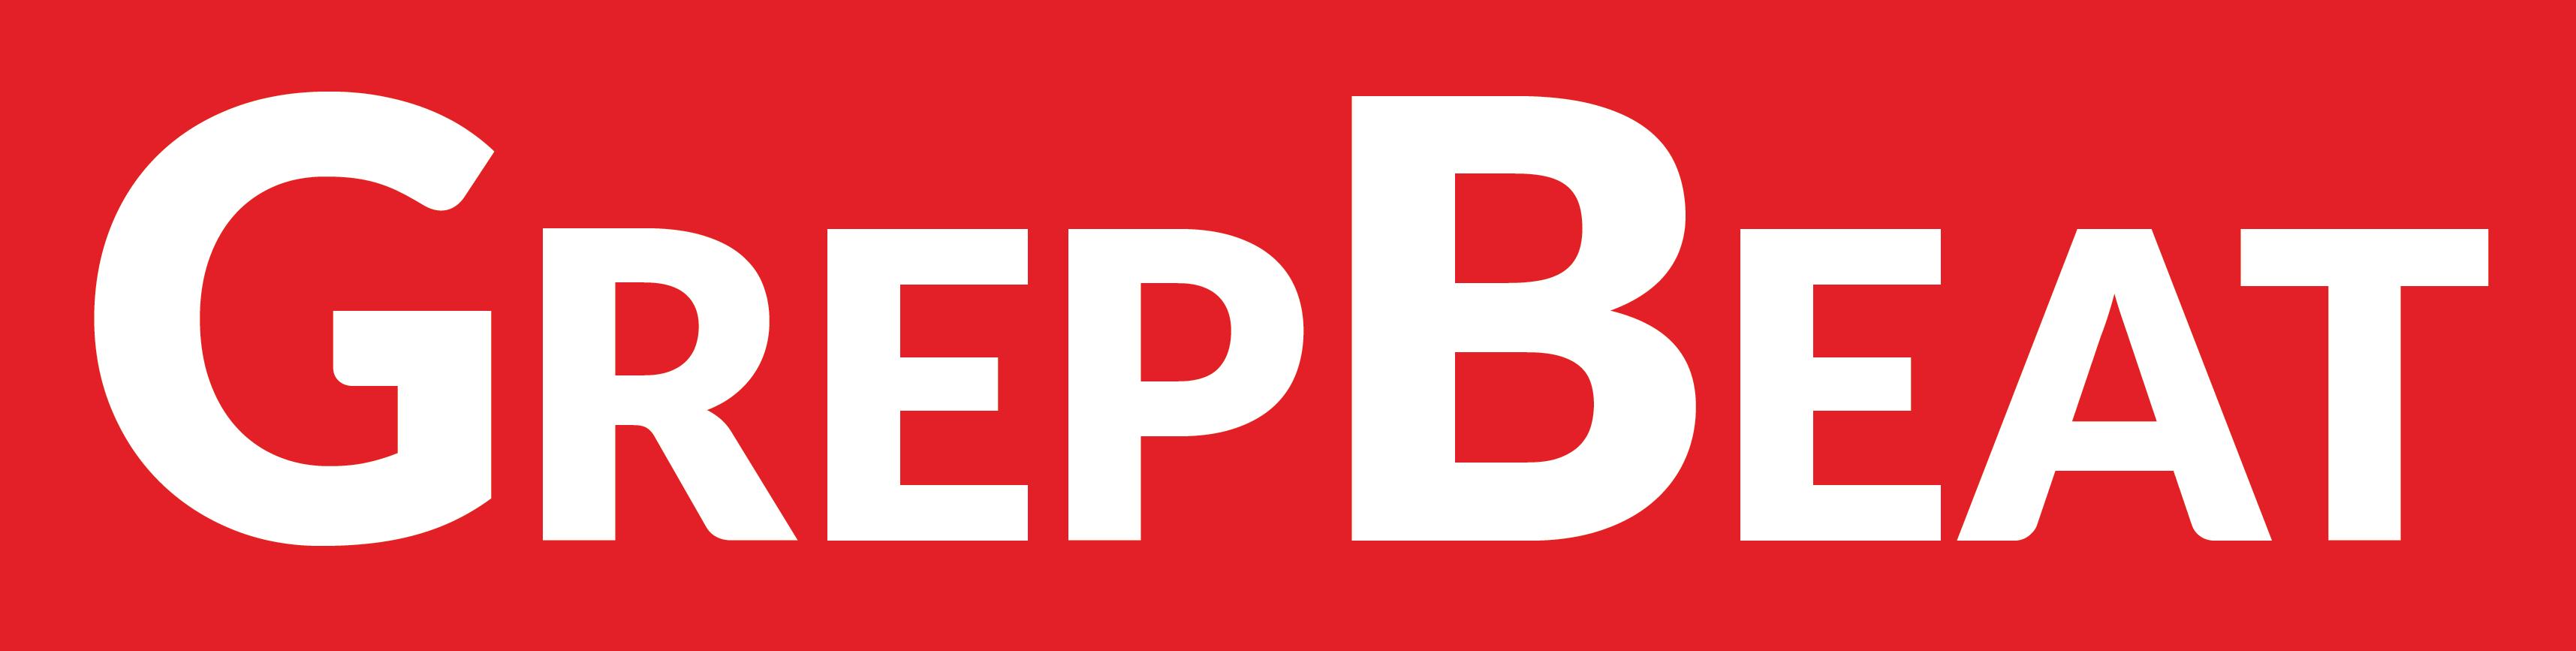 redgrepbeatbanner